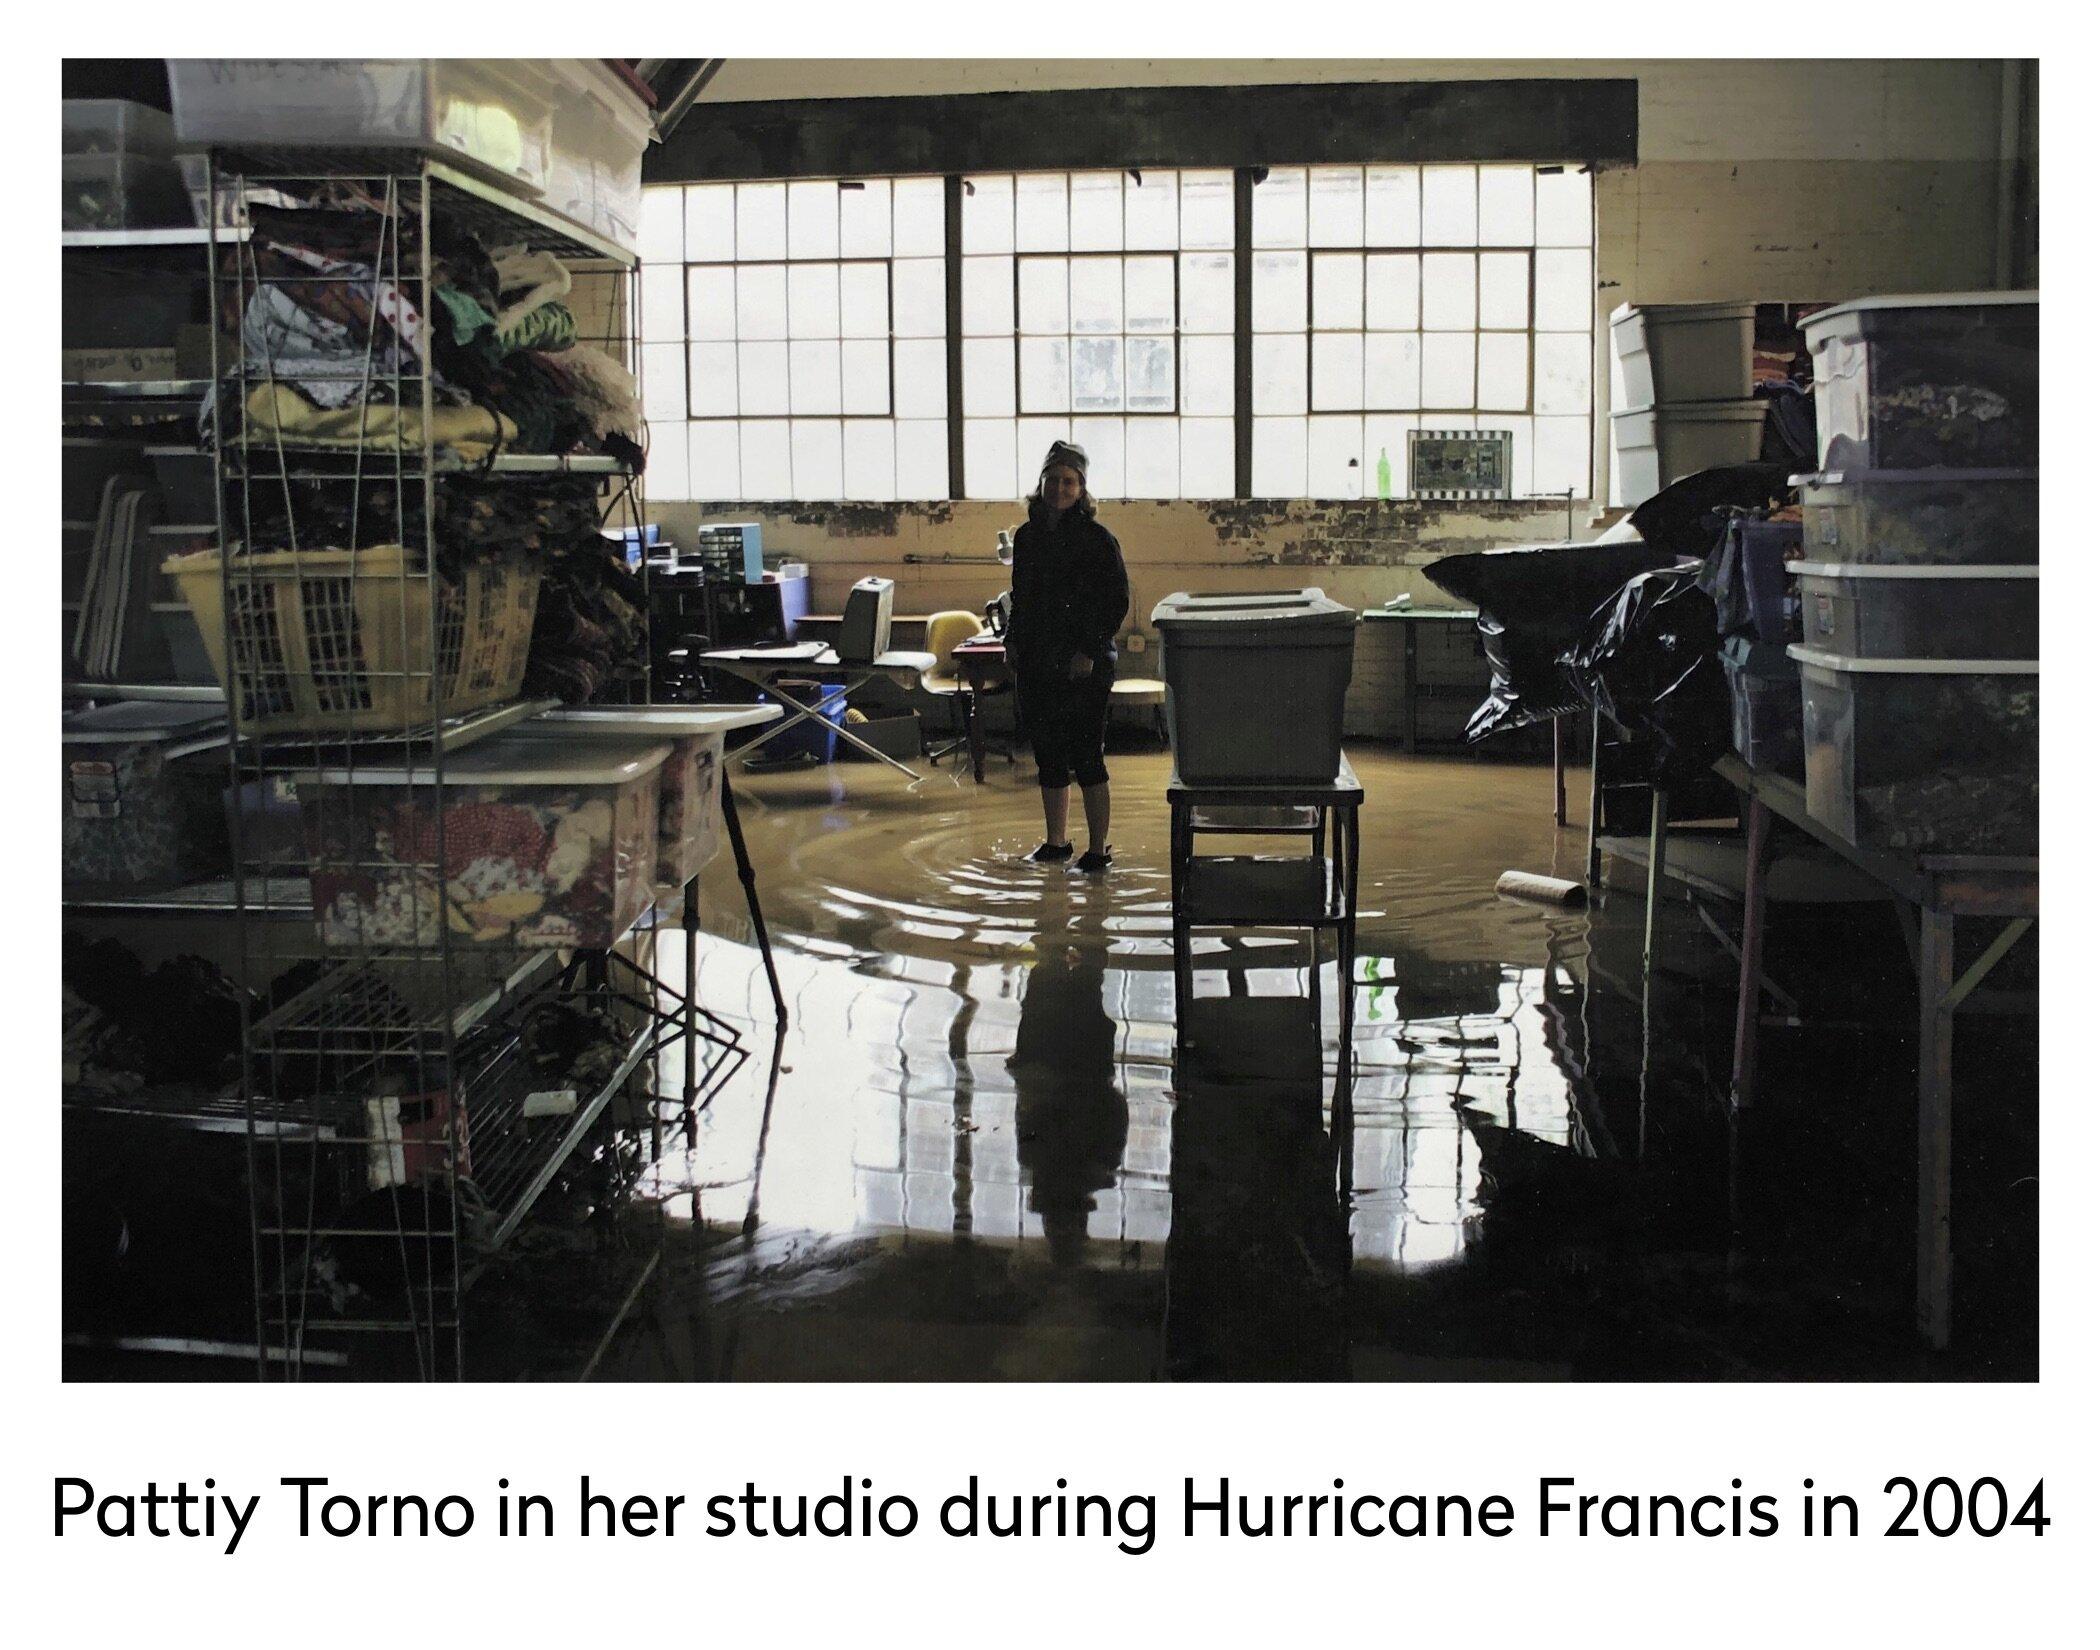 pattiy in studio hurricane francis 2004.jpg